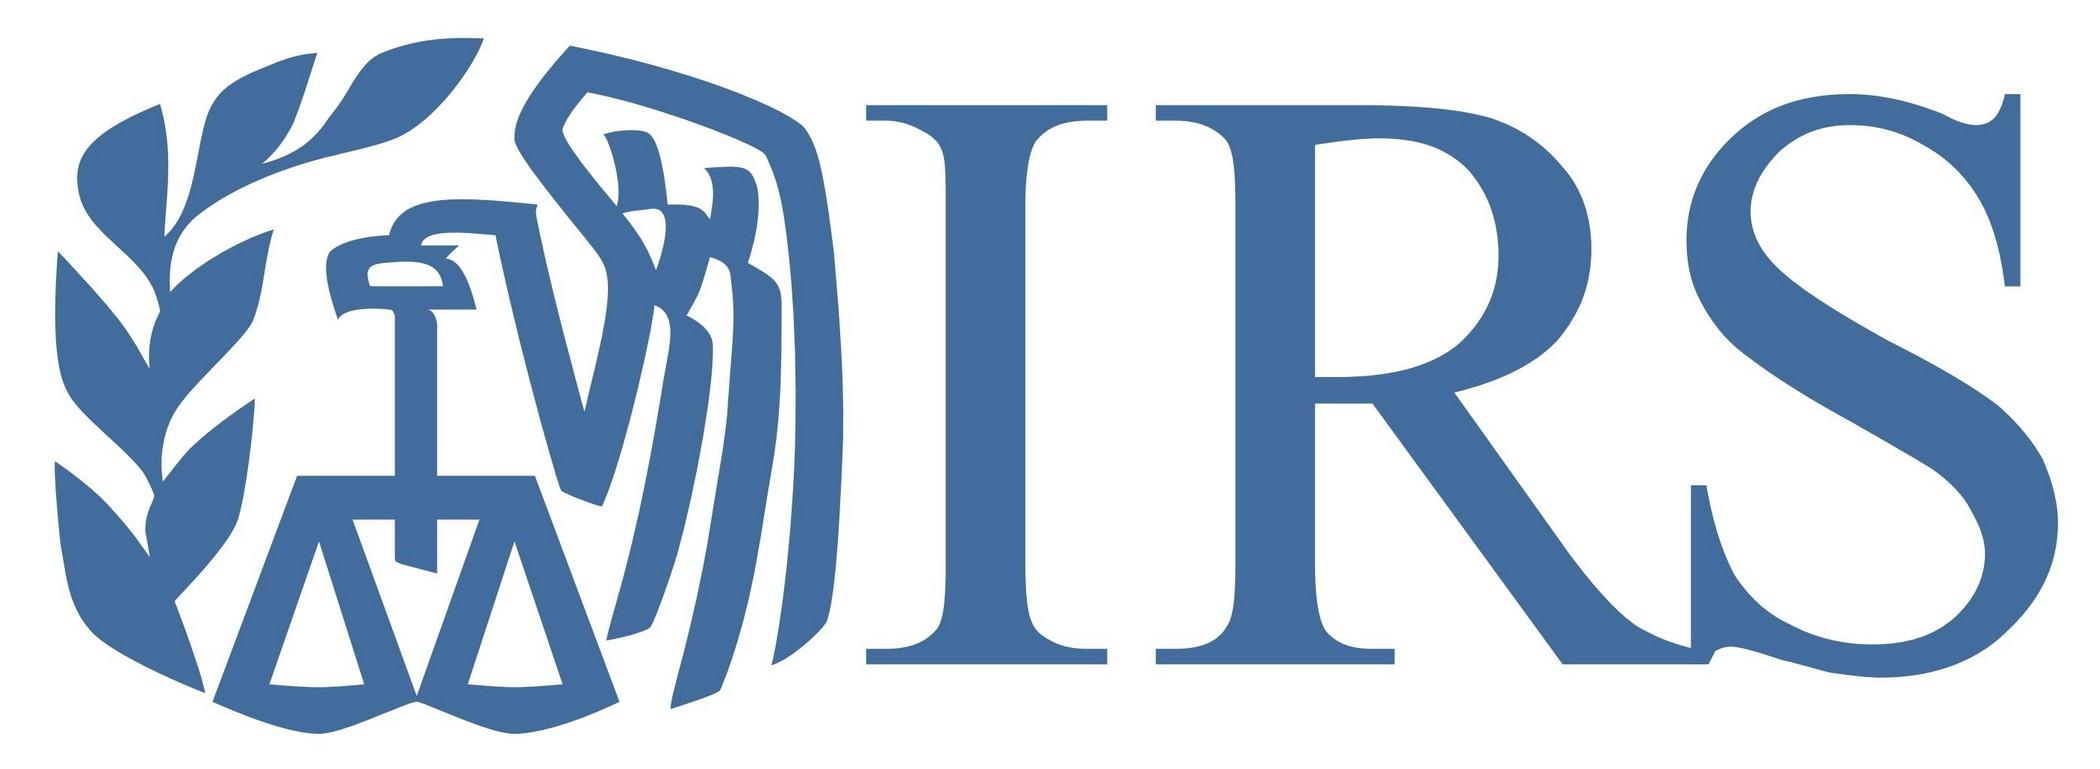 Evítese ajetreos: Verifique el estado de su reembolso en IRS.gov